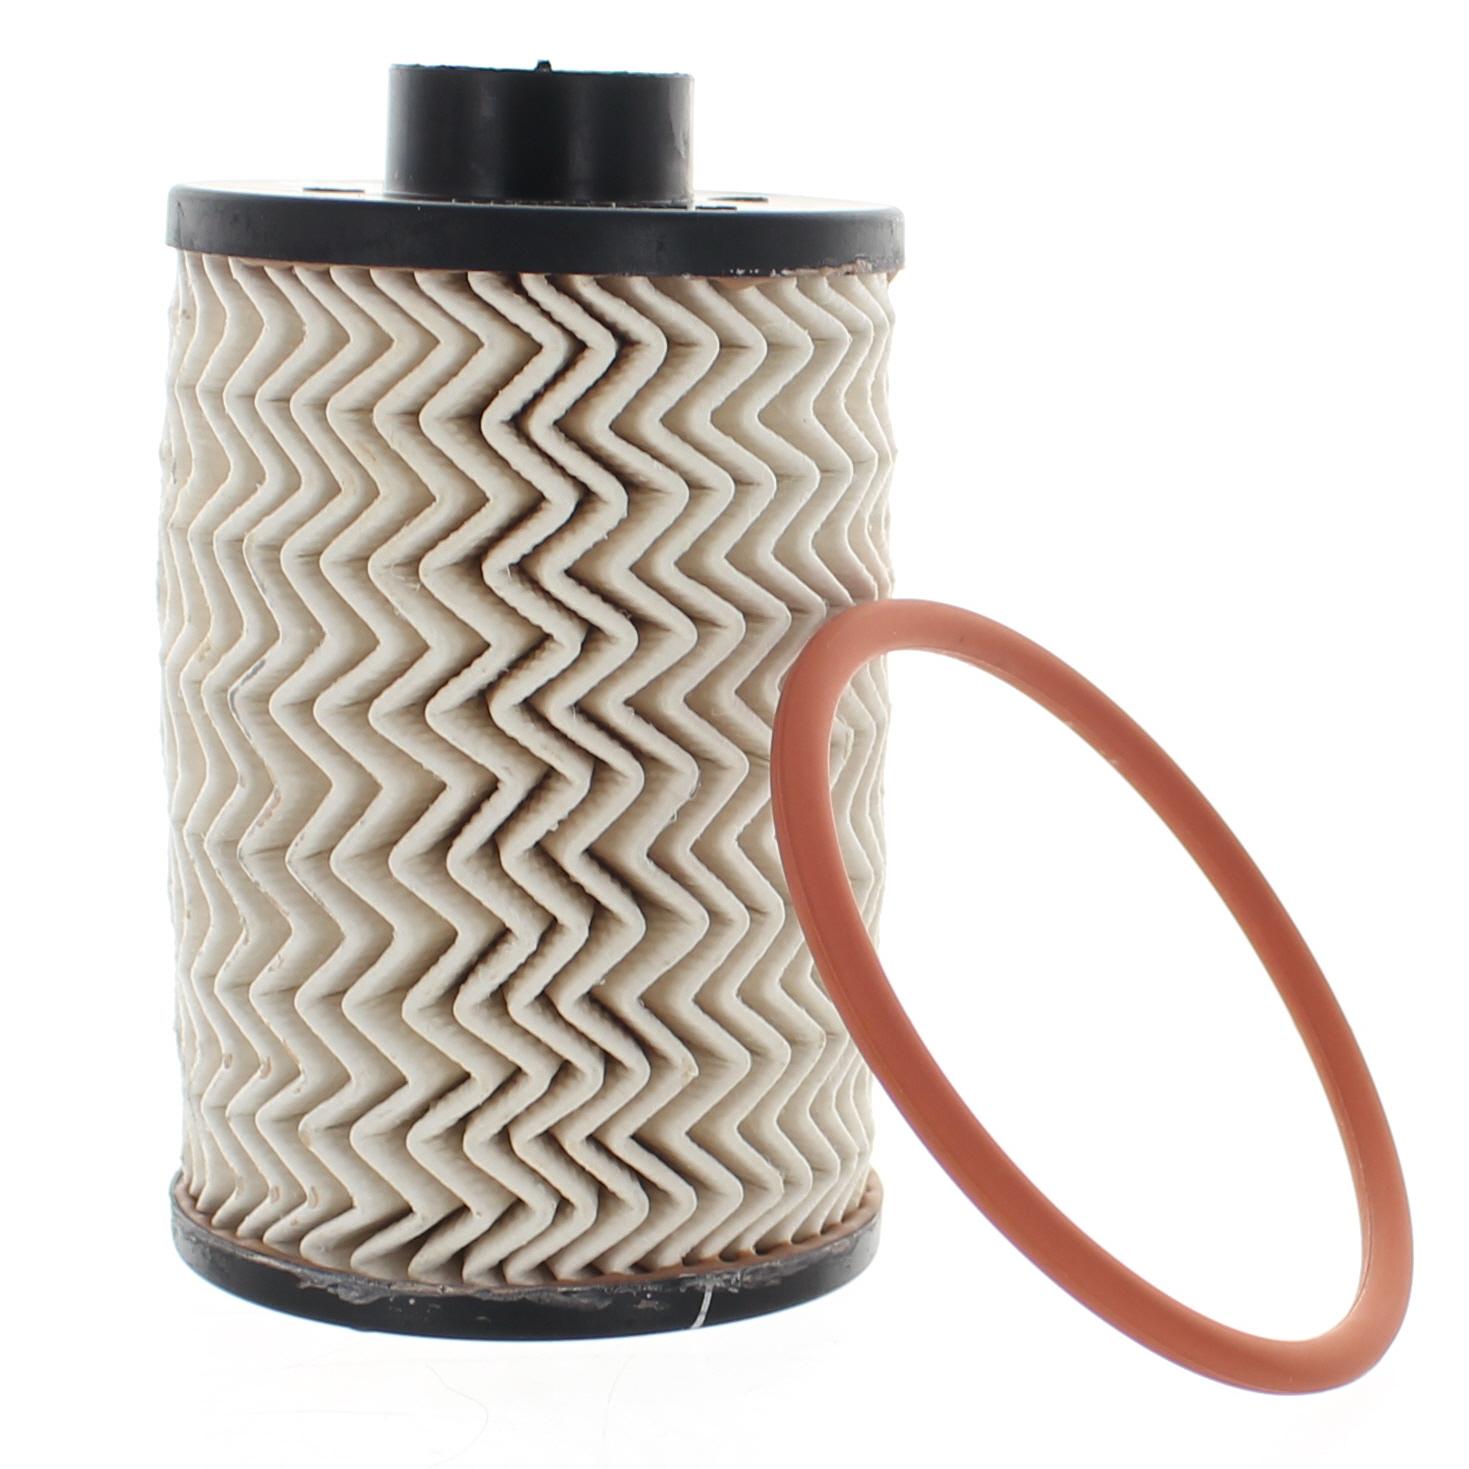 Image is loading Mahindra-Roxor-New-OEM-Kit-Fuel-Filter-Element-